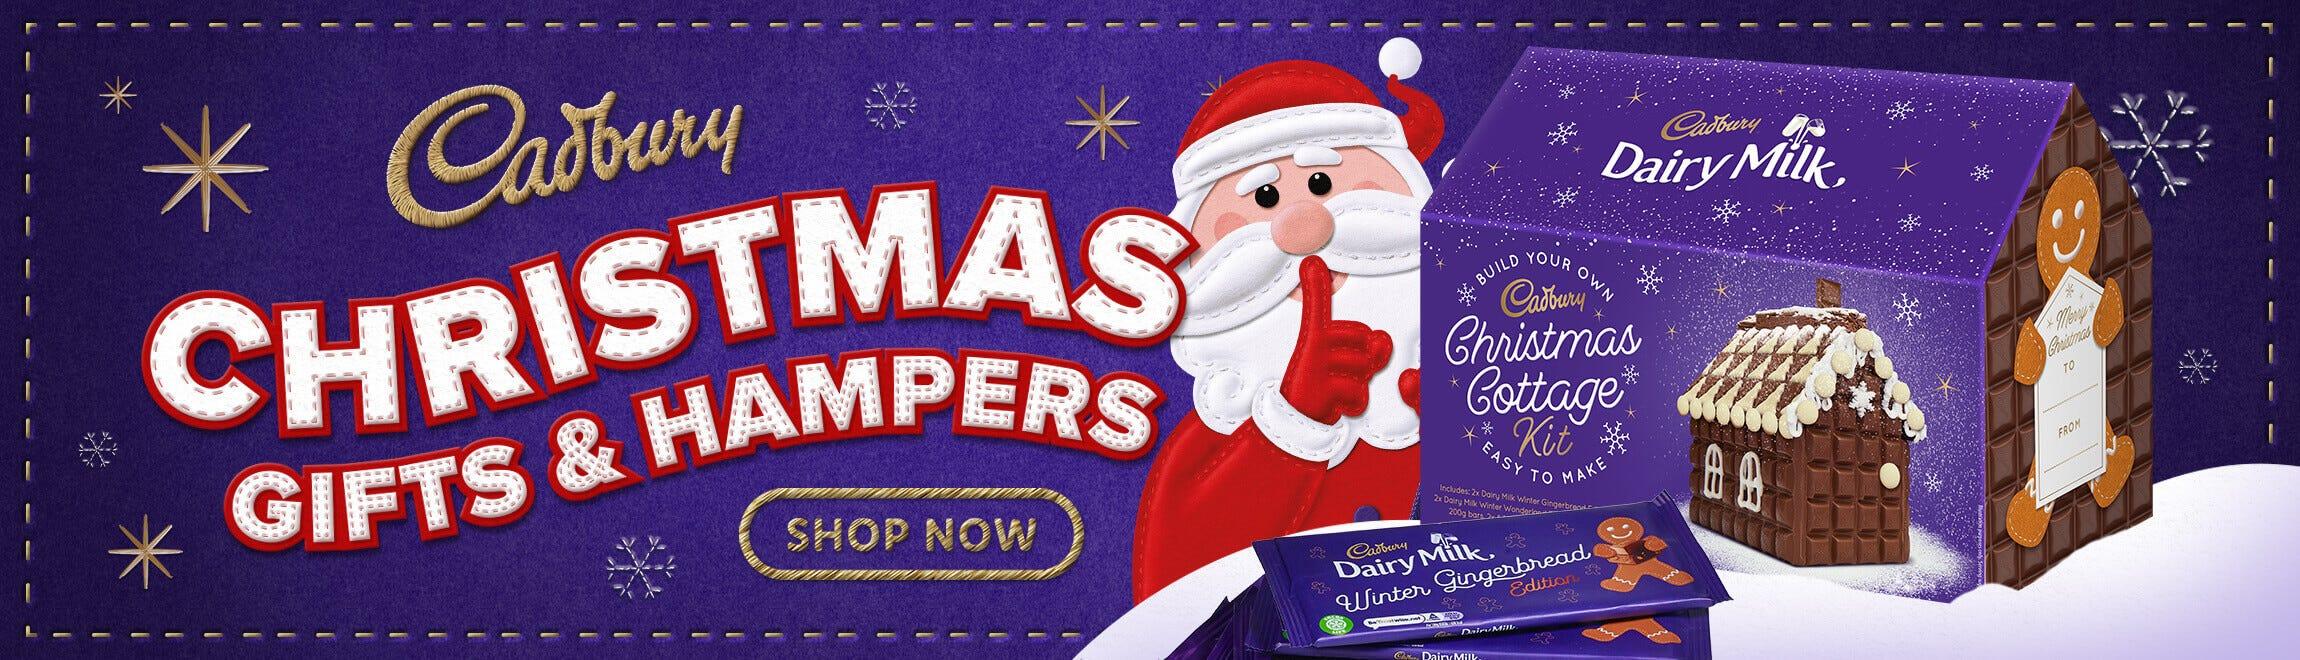 Cadbury Christmas Gifts & Hampers